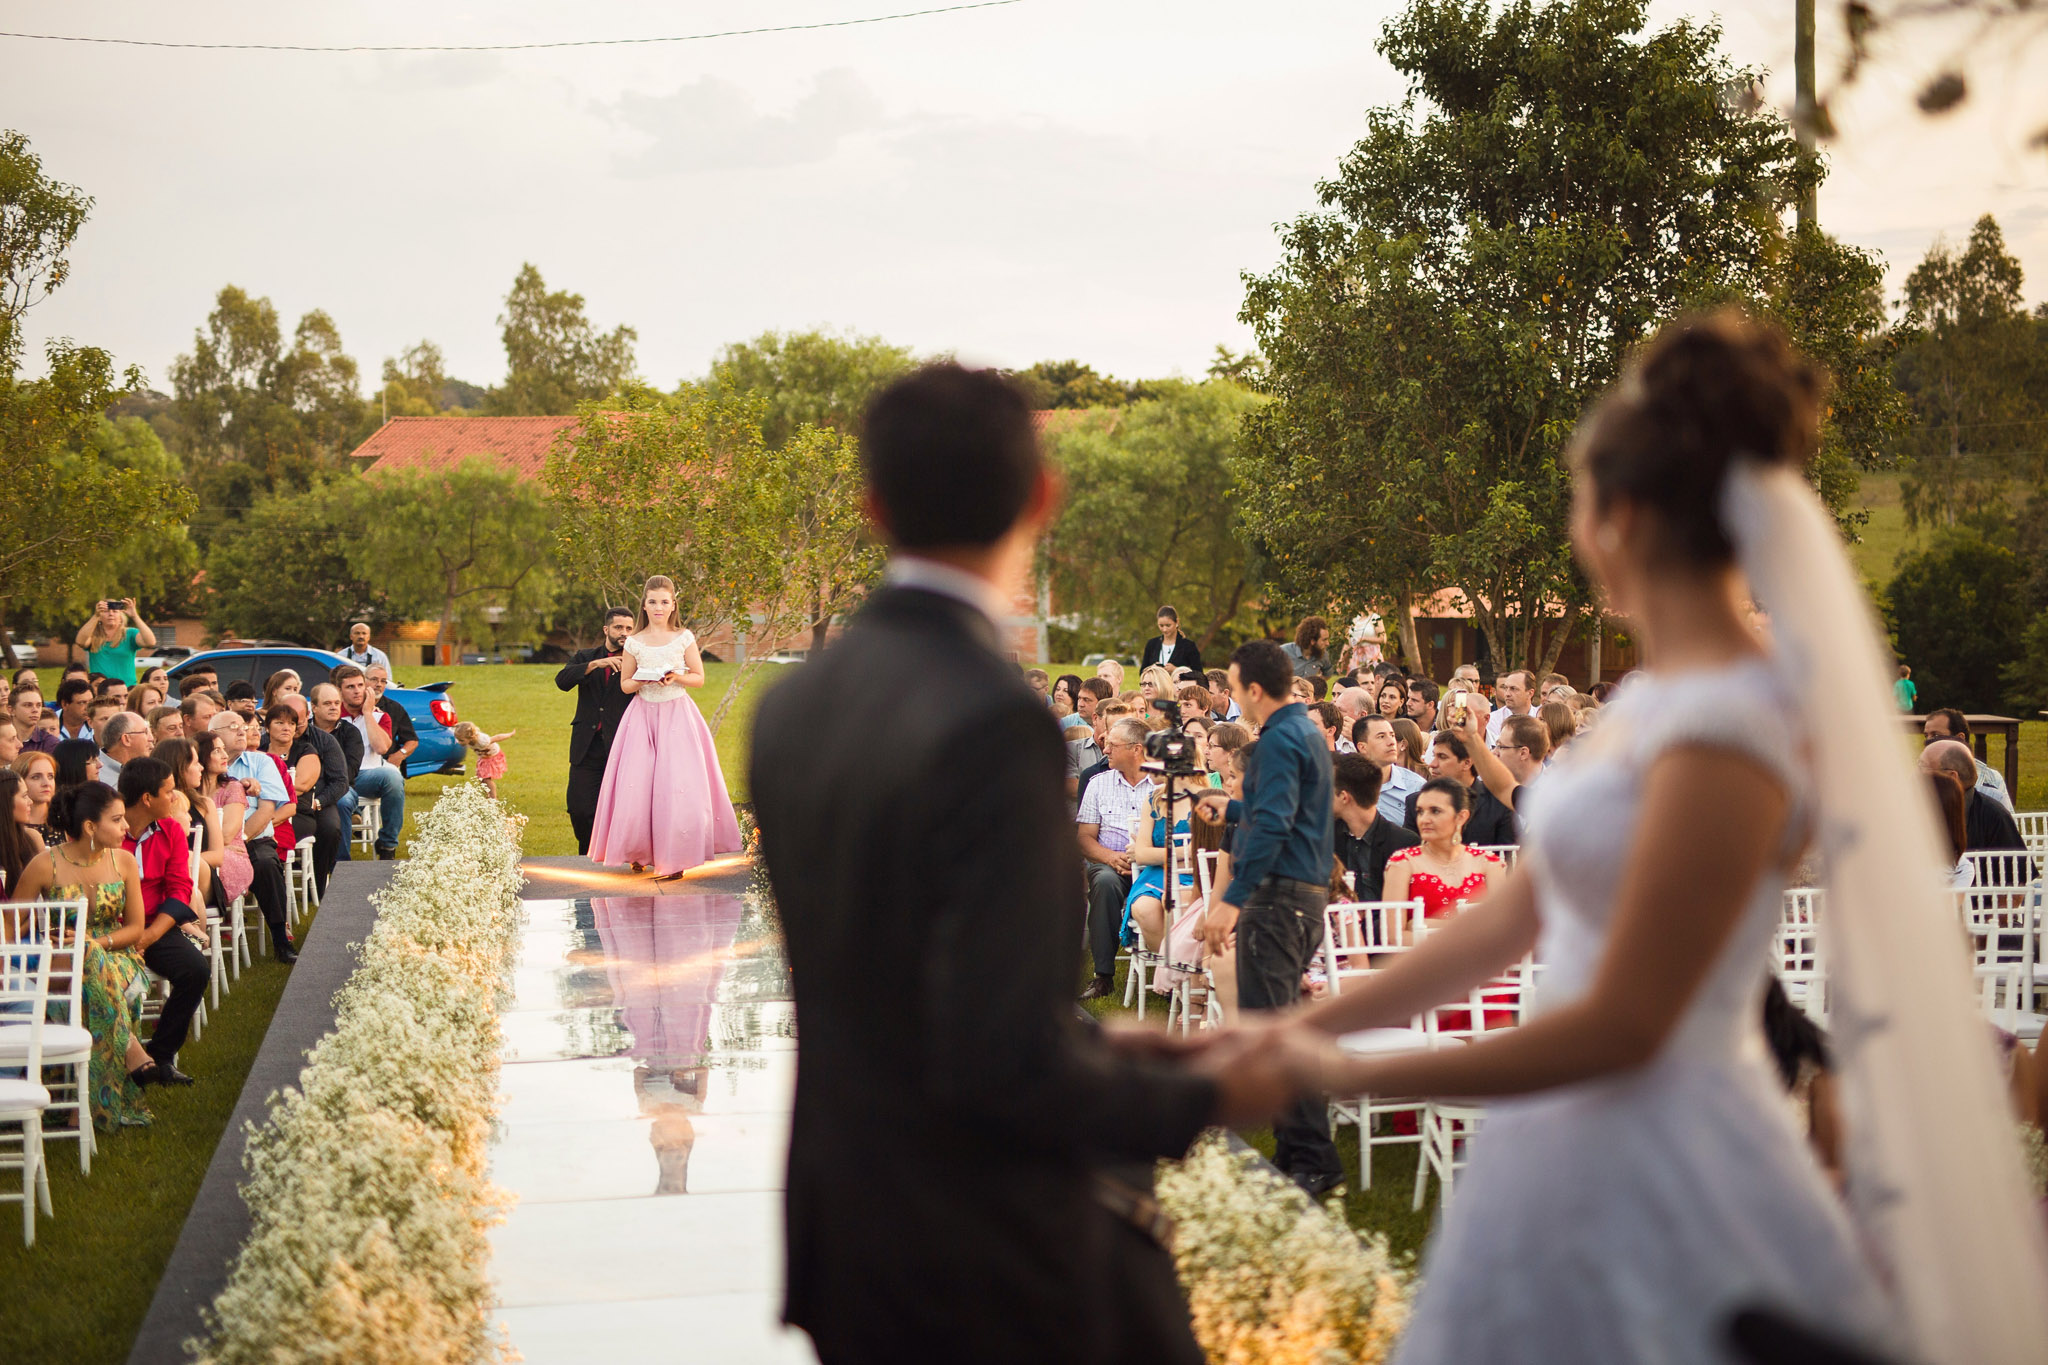 Wedding_Travellers_Destination_Wedding_Photography-112.jpg